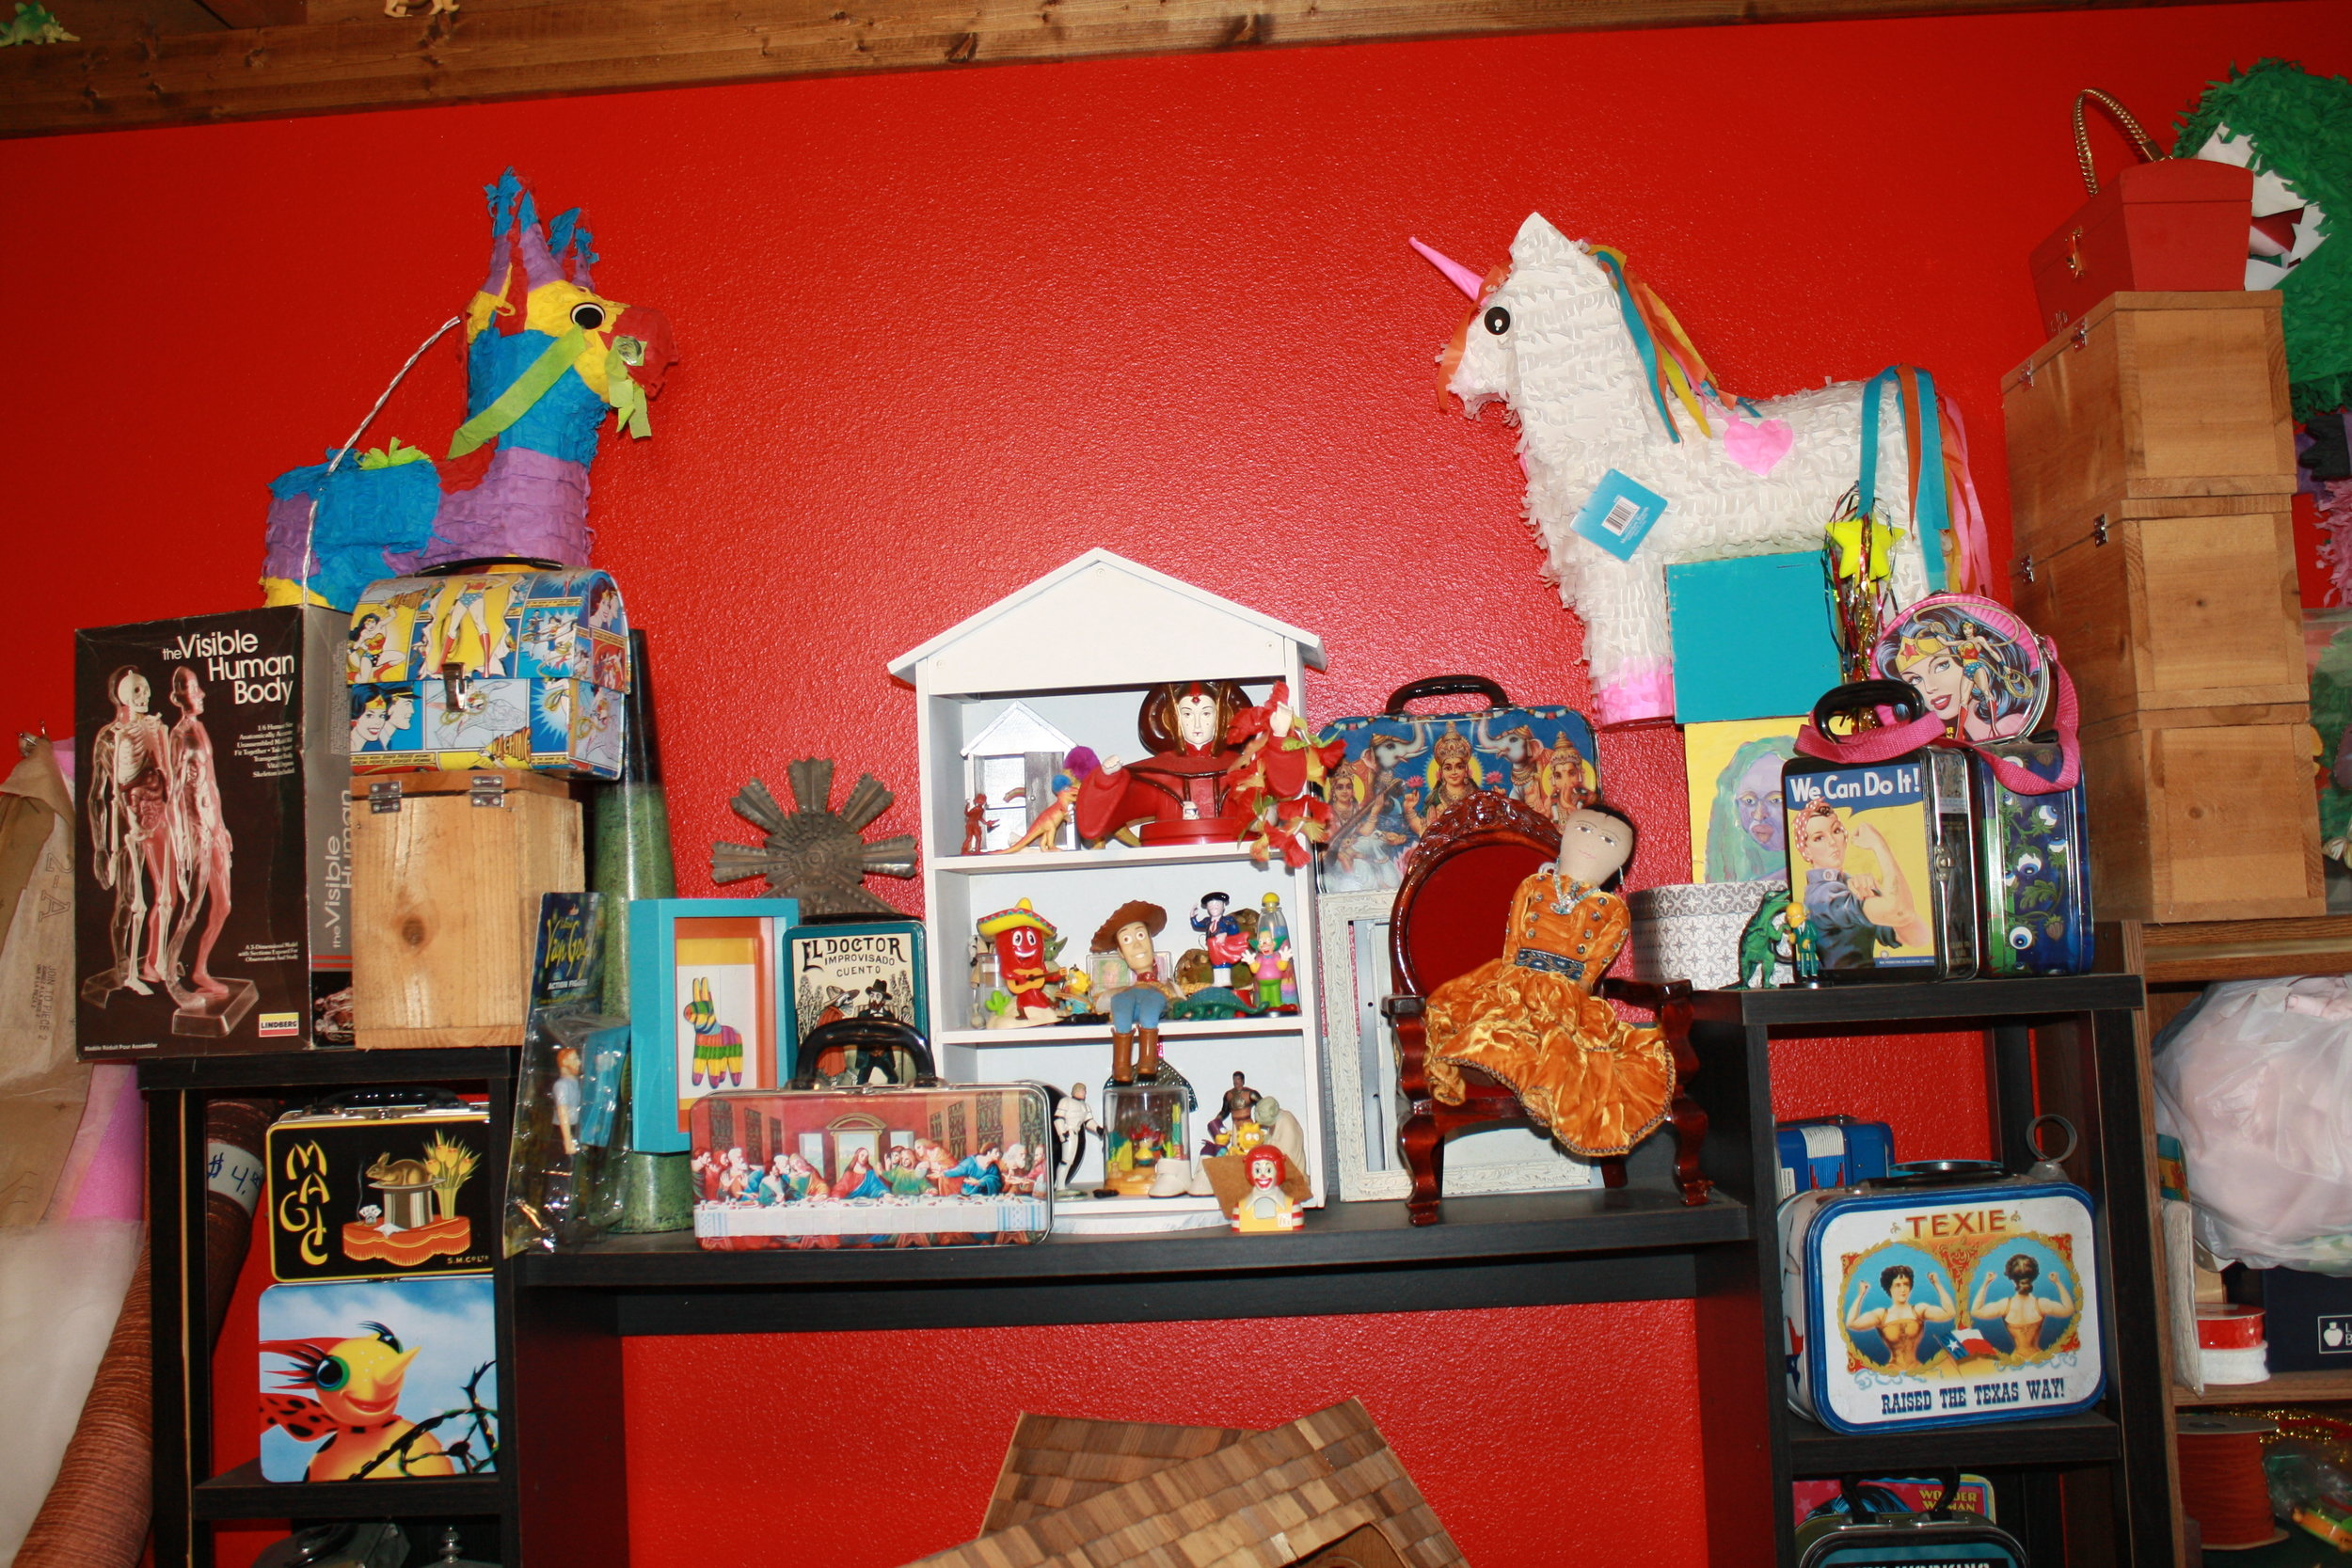 Fiesta Room toys